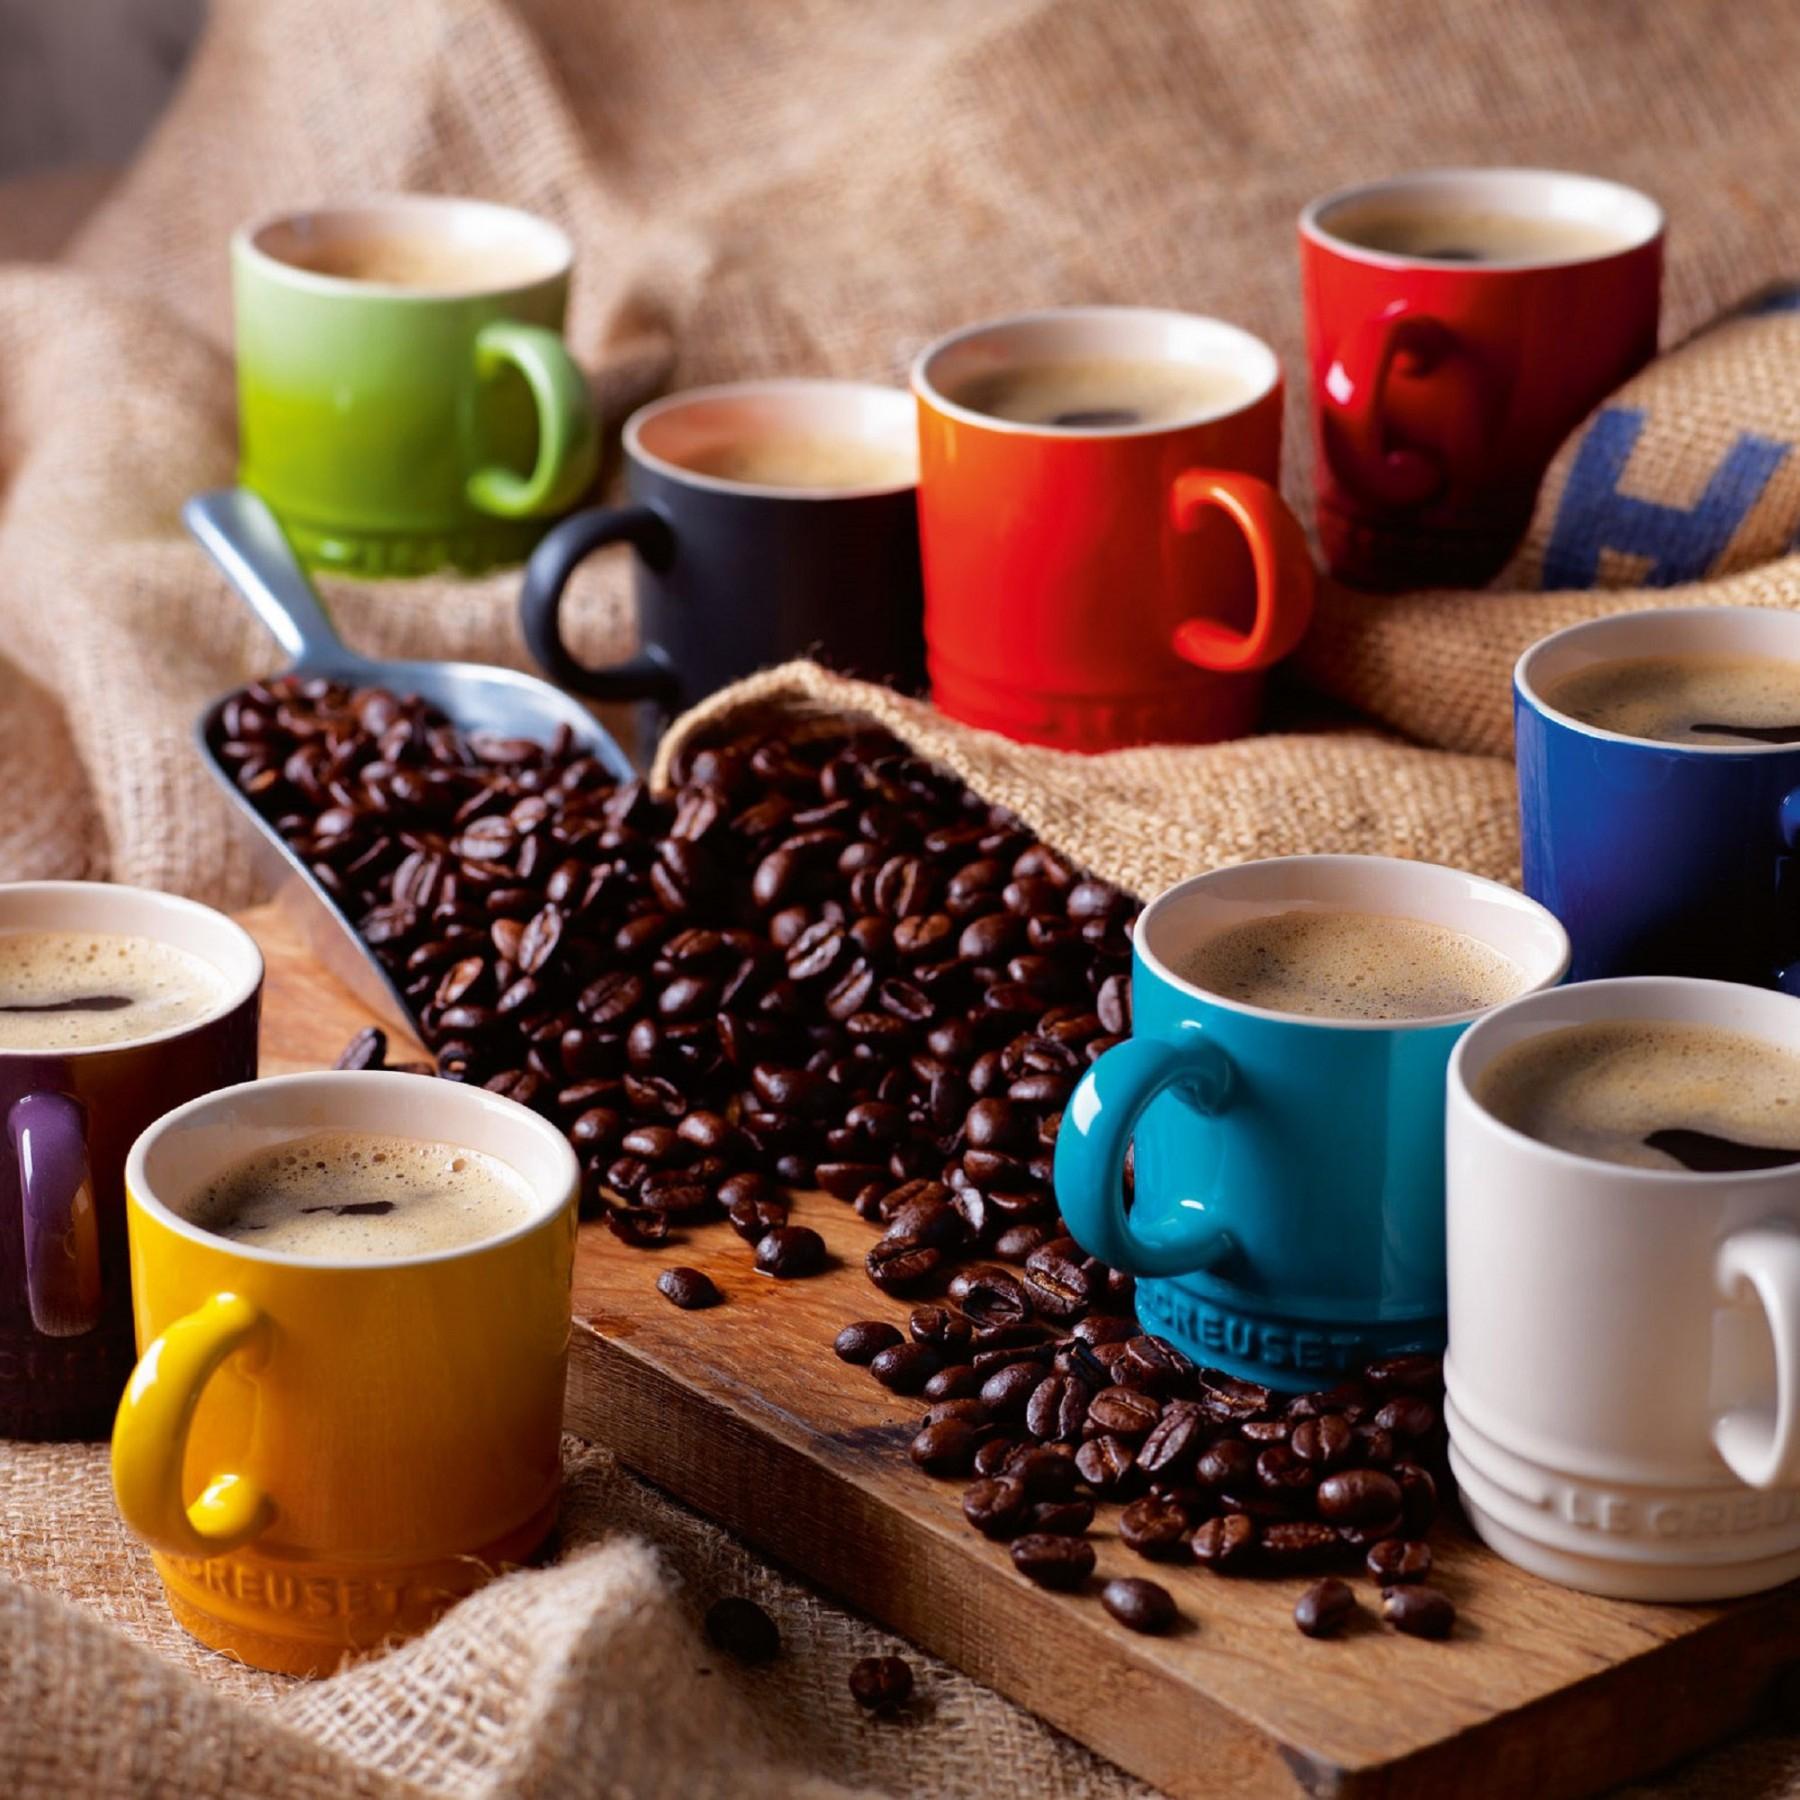 40% off Le Creuset stoneware deals- mugs, teapots, jugs etc... at BrandAlley